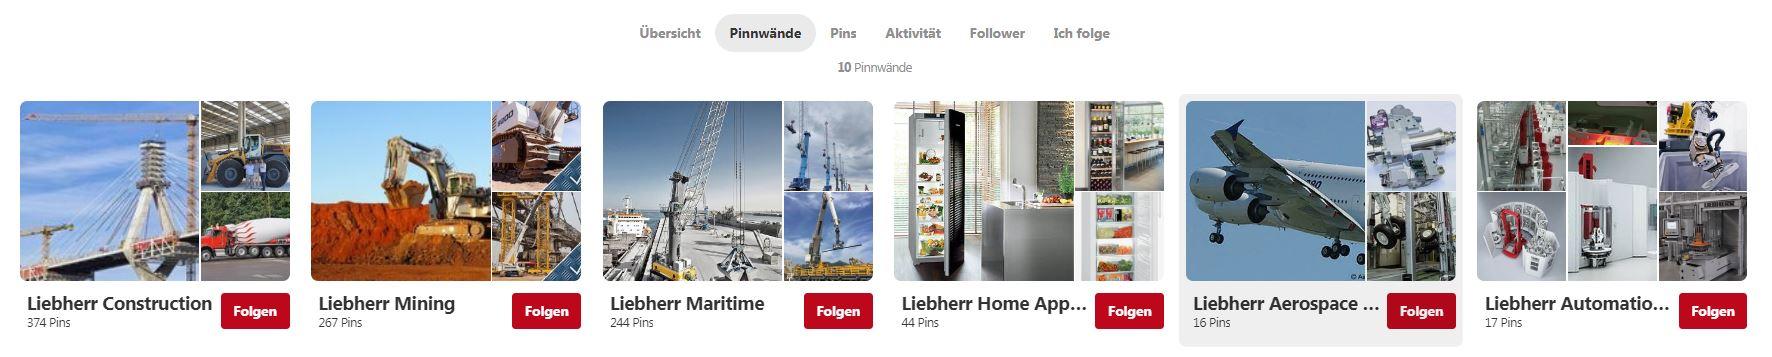 Pinterest-B2B-Liebherr-Pinnwand